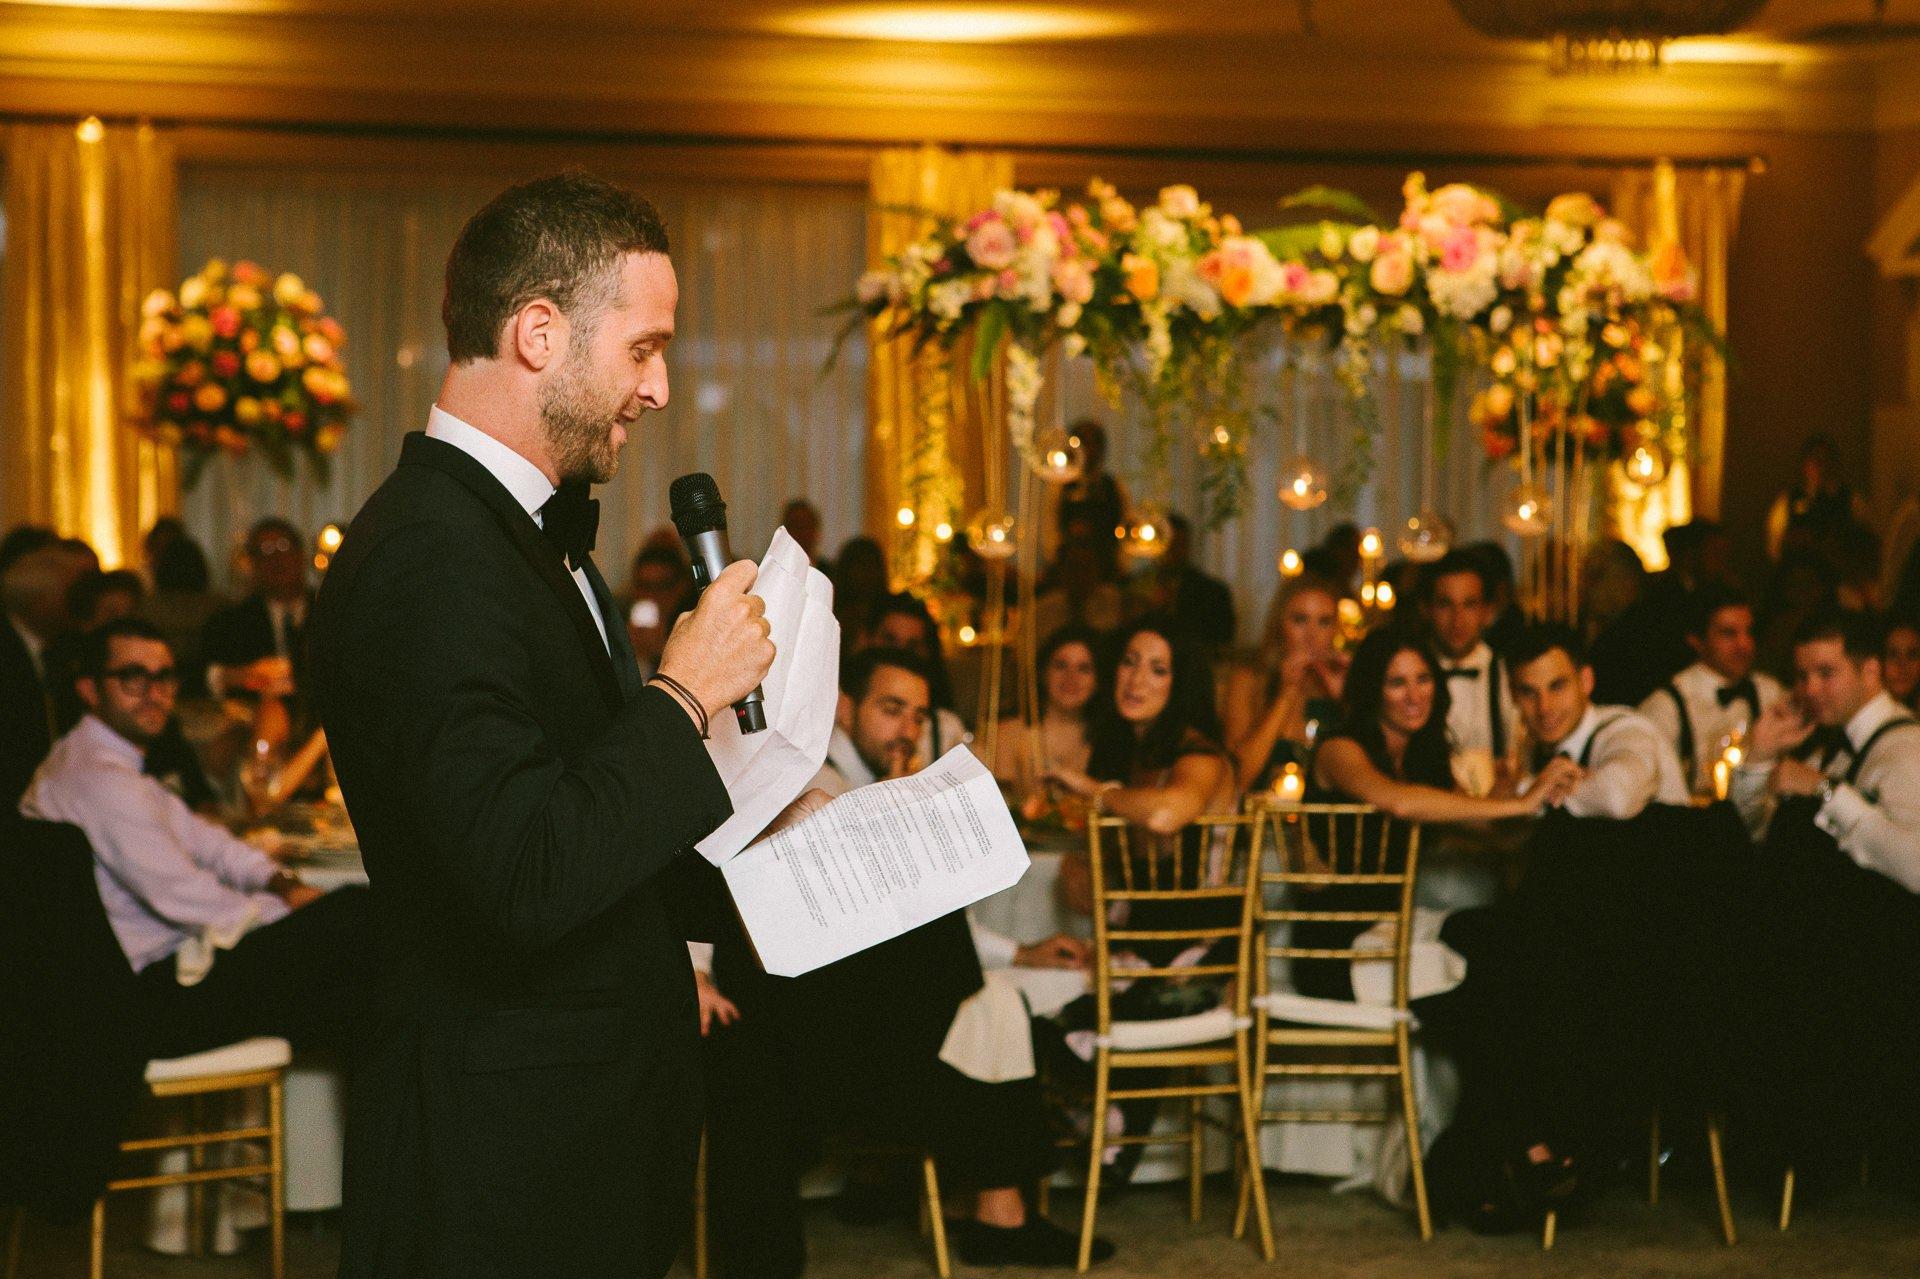 Beechmont Country Club Wedding Photographer in Beachwood 3 7.jpg